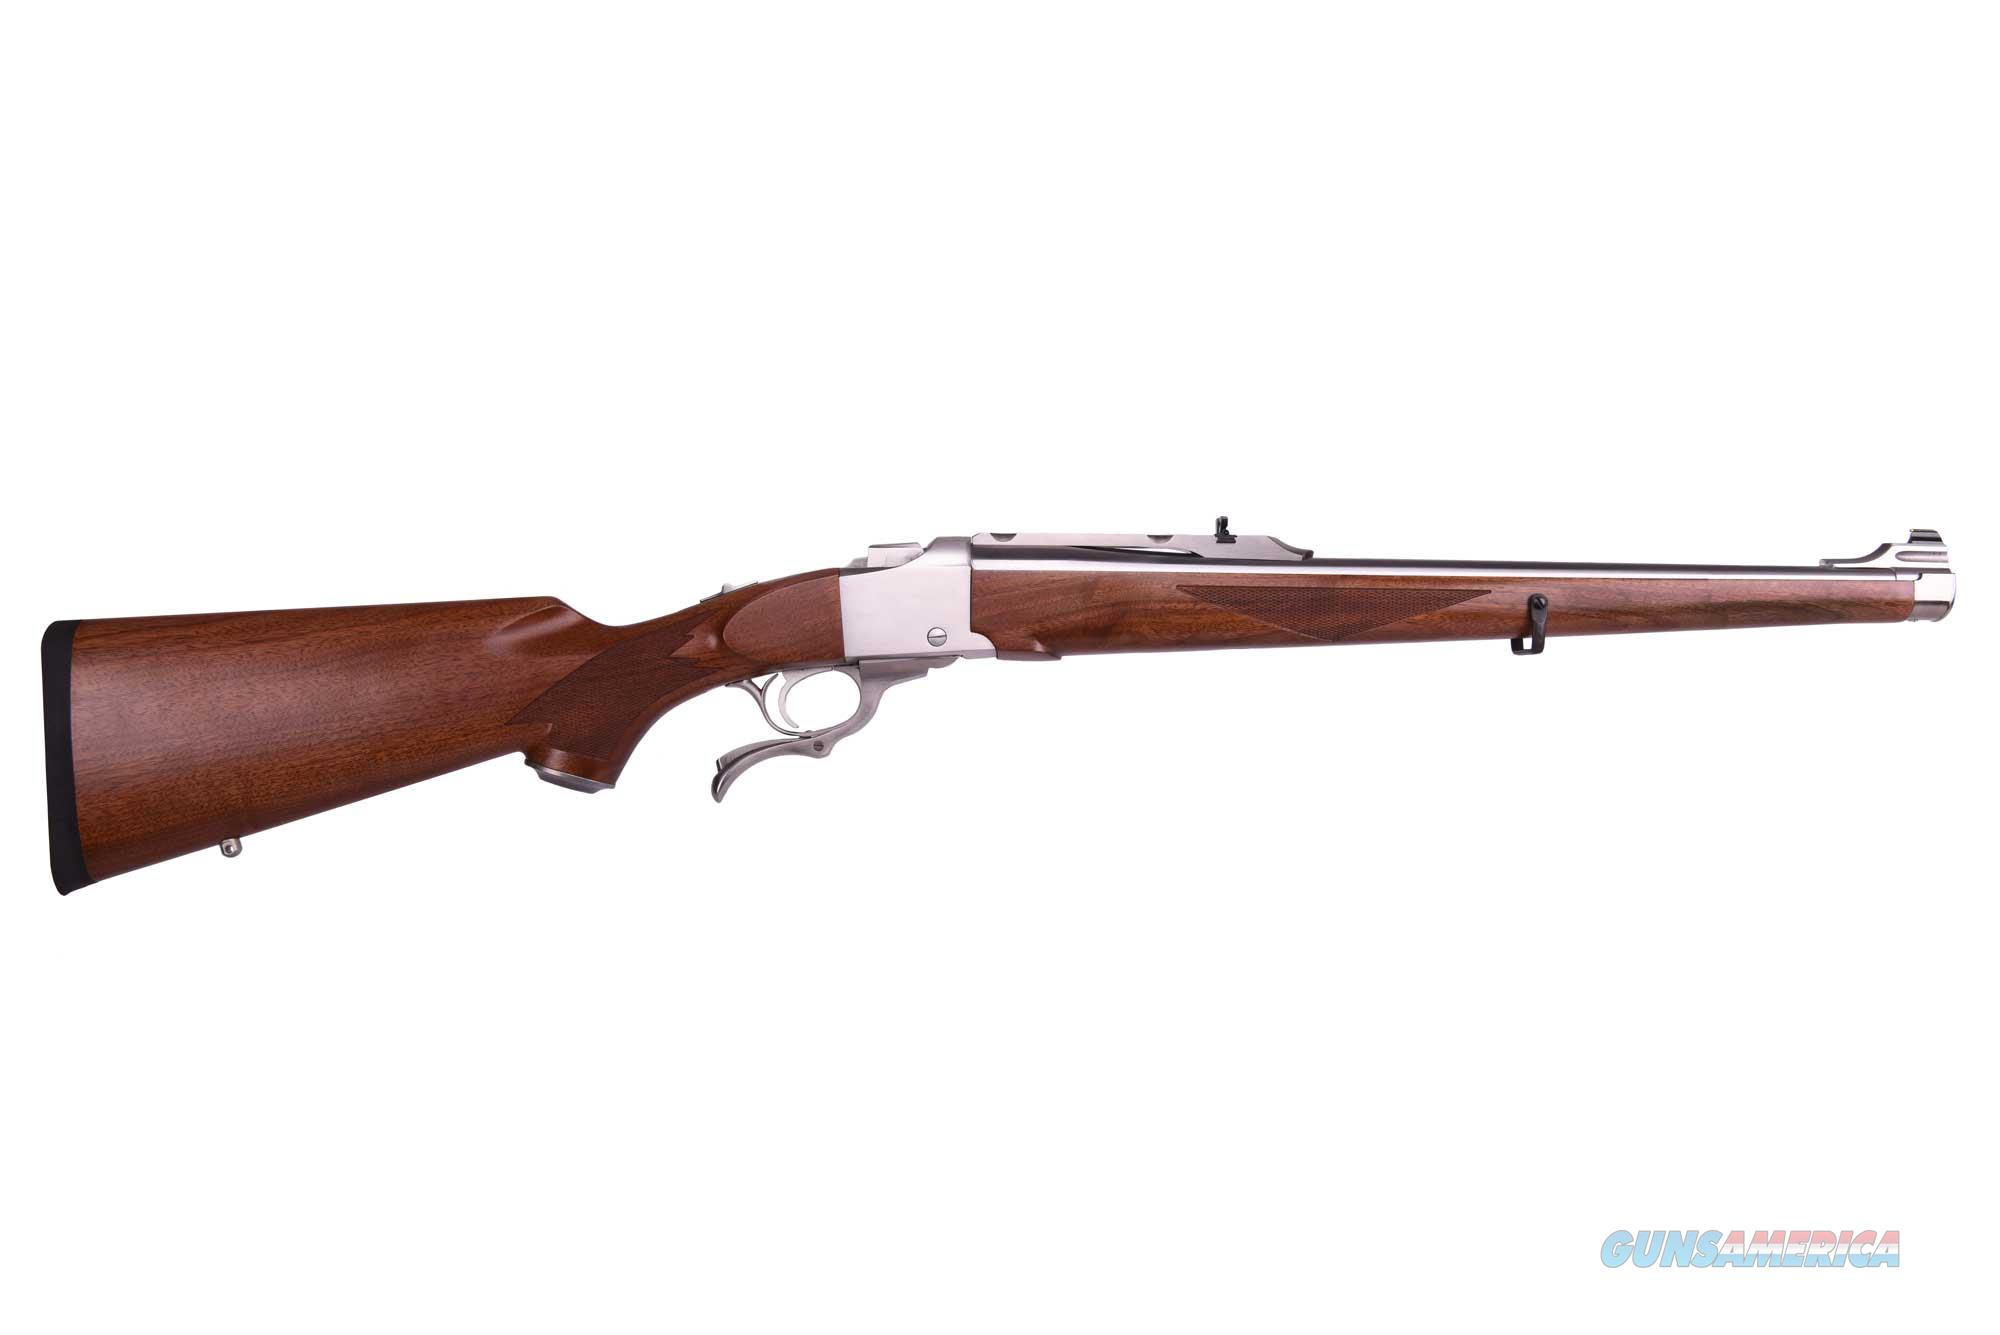 "Ruger K1rsi Int'l Ss/Wd 257 Rob 20"" 21318  Guns > Rifles > R Misc Rifles"